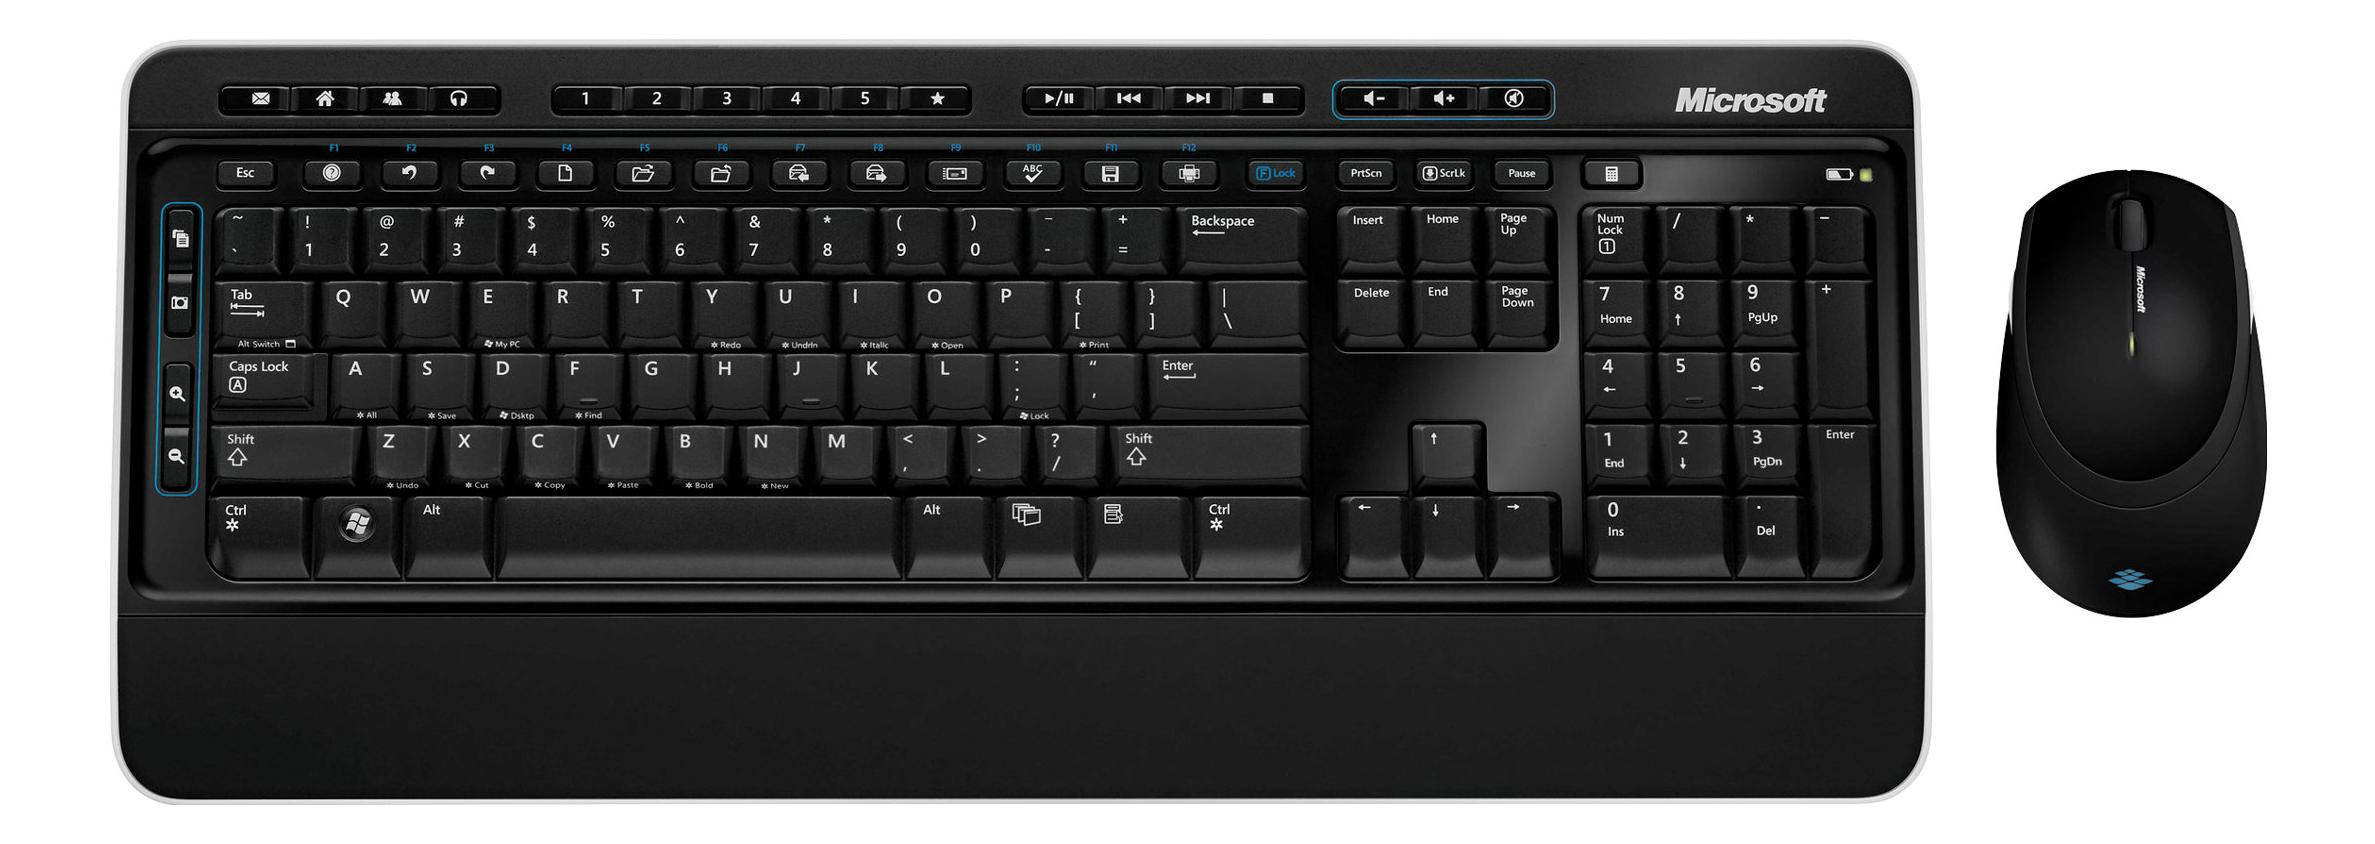 Tastaturmus MICROSOFT 3050 wireless   Staples®